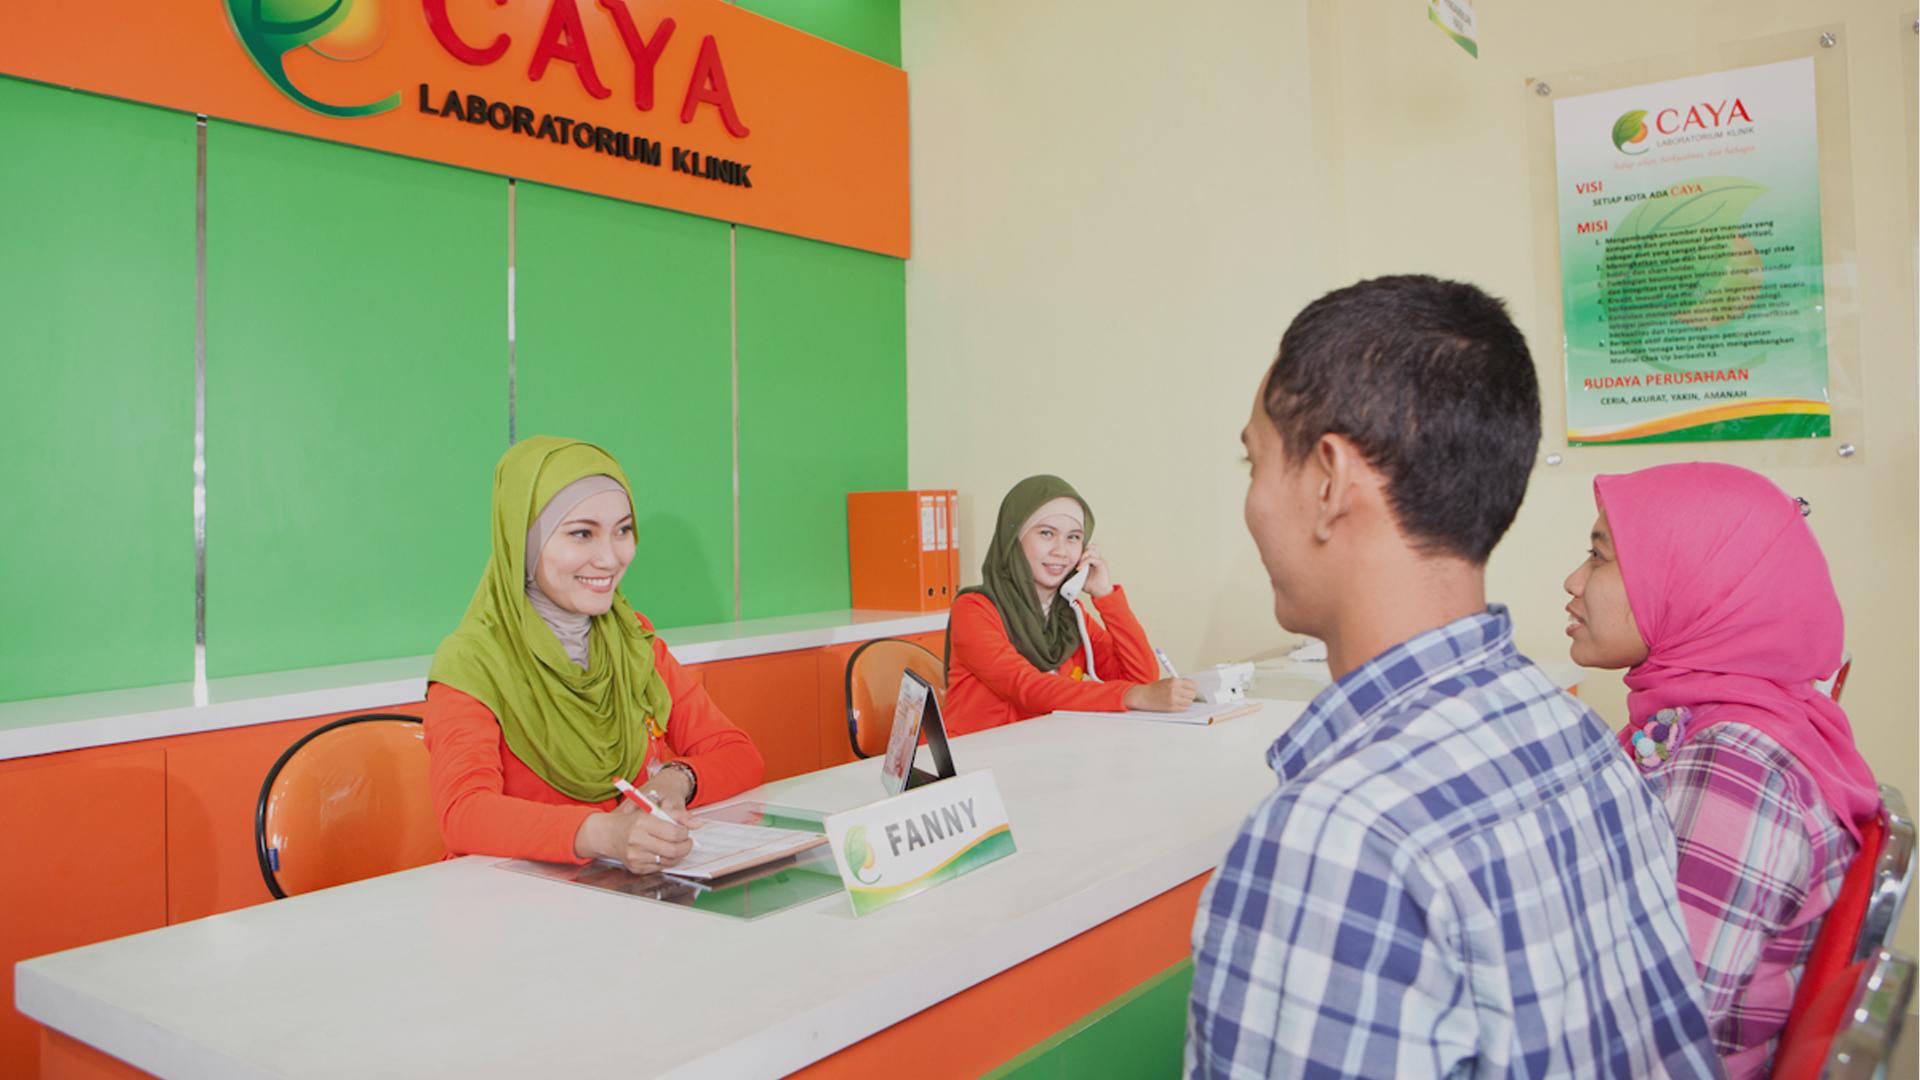 Laboratorium Klinik Caya Surabaya